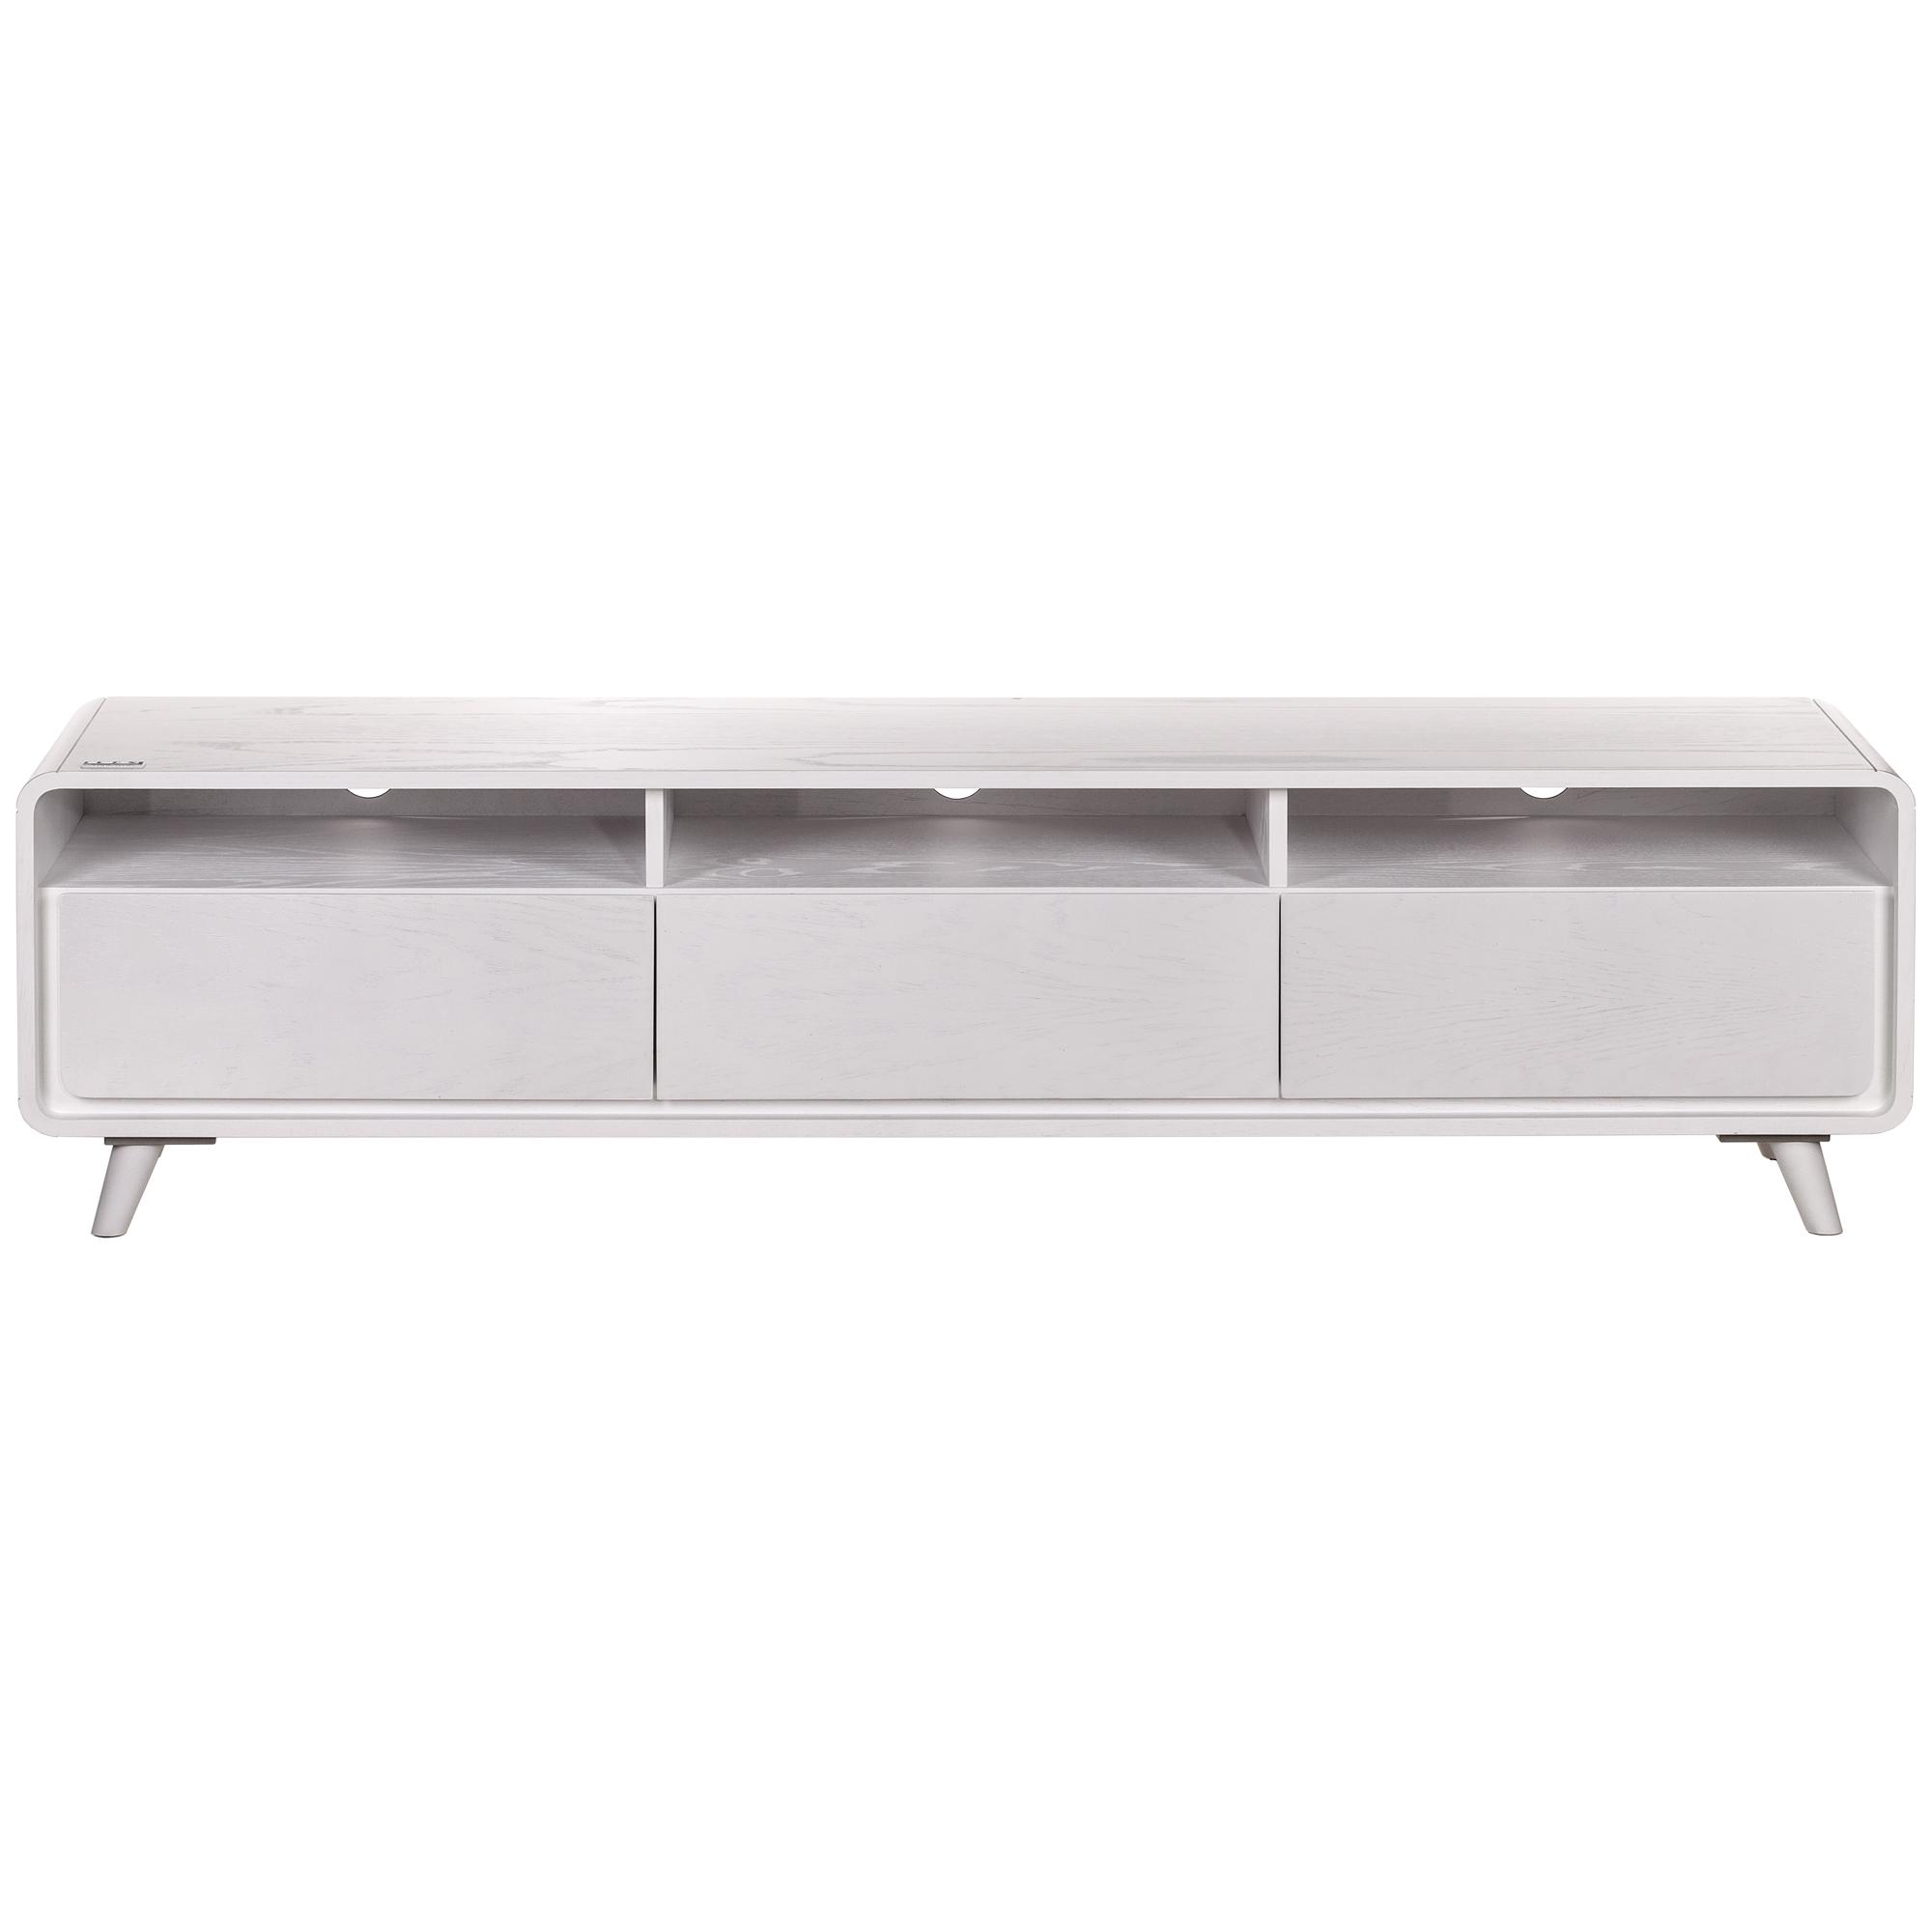 خرید اینترنتی میز تلویزیون آیلکس مدل LONIZ 3D-WHITE WASH-180 اورجینال